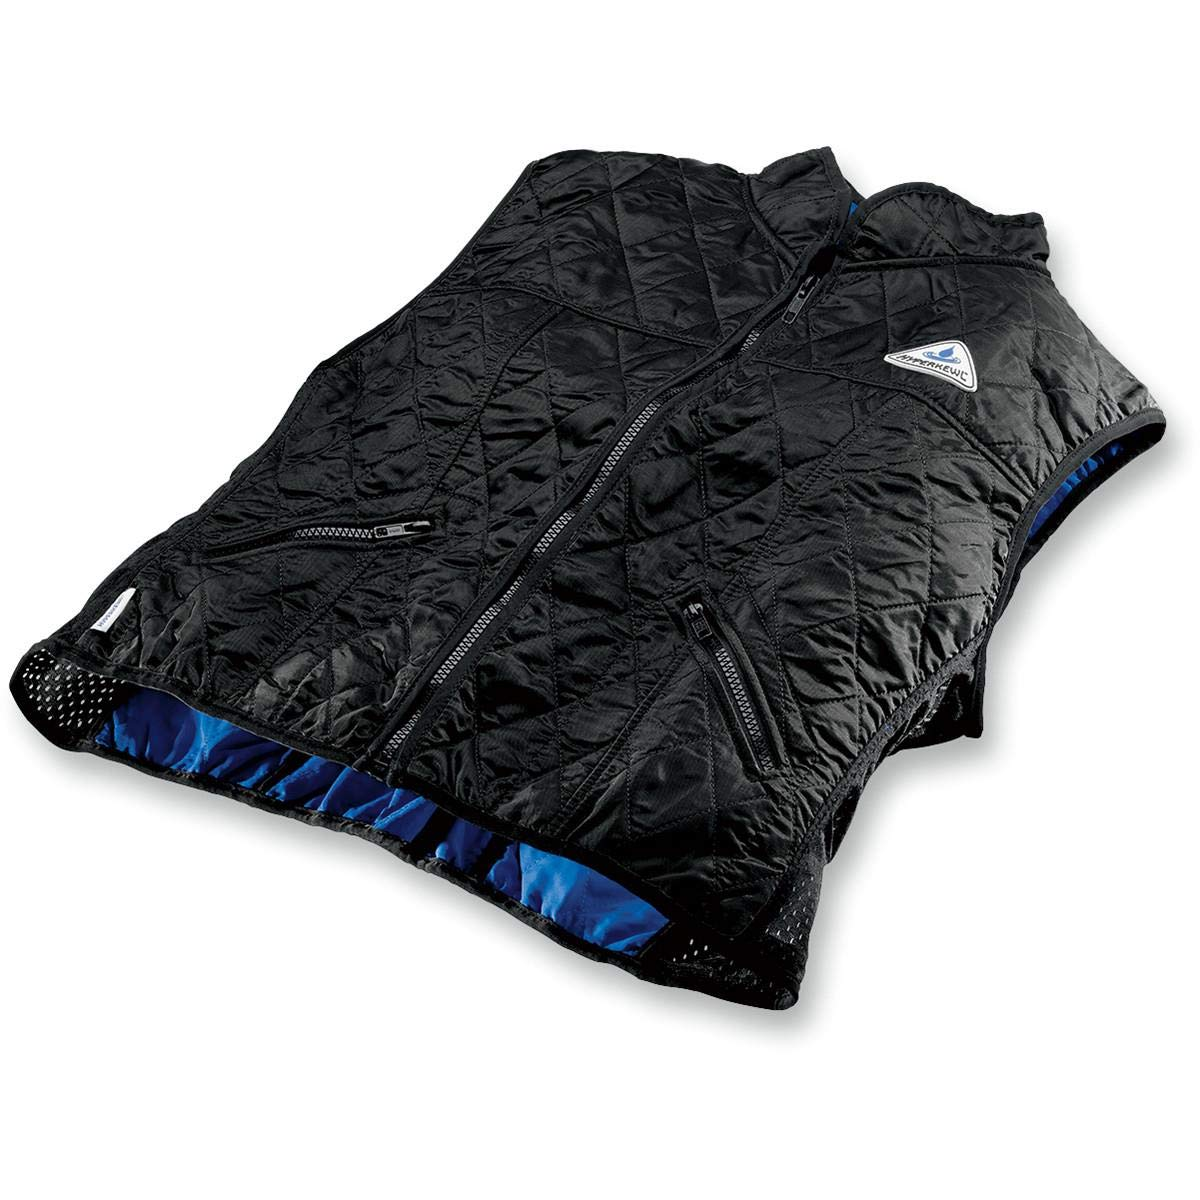 Techniche Womens Hyperkewl Deluxe Cooling Vest , Gender: Womens, Primary Color: Black, Size: Lg, Distinct Name: Black 6530F BK L